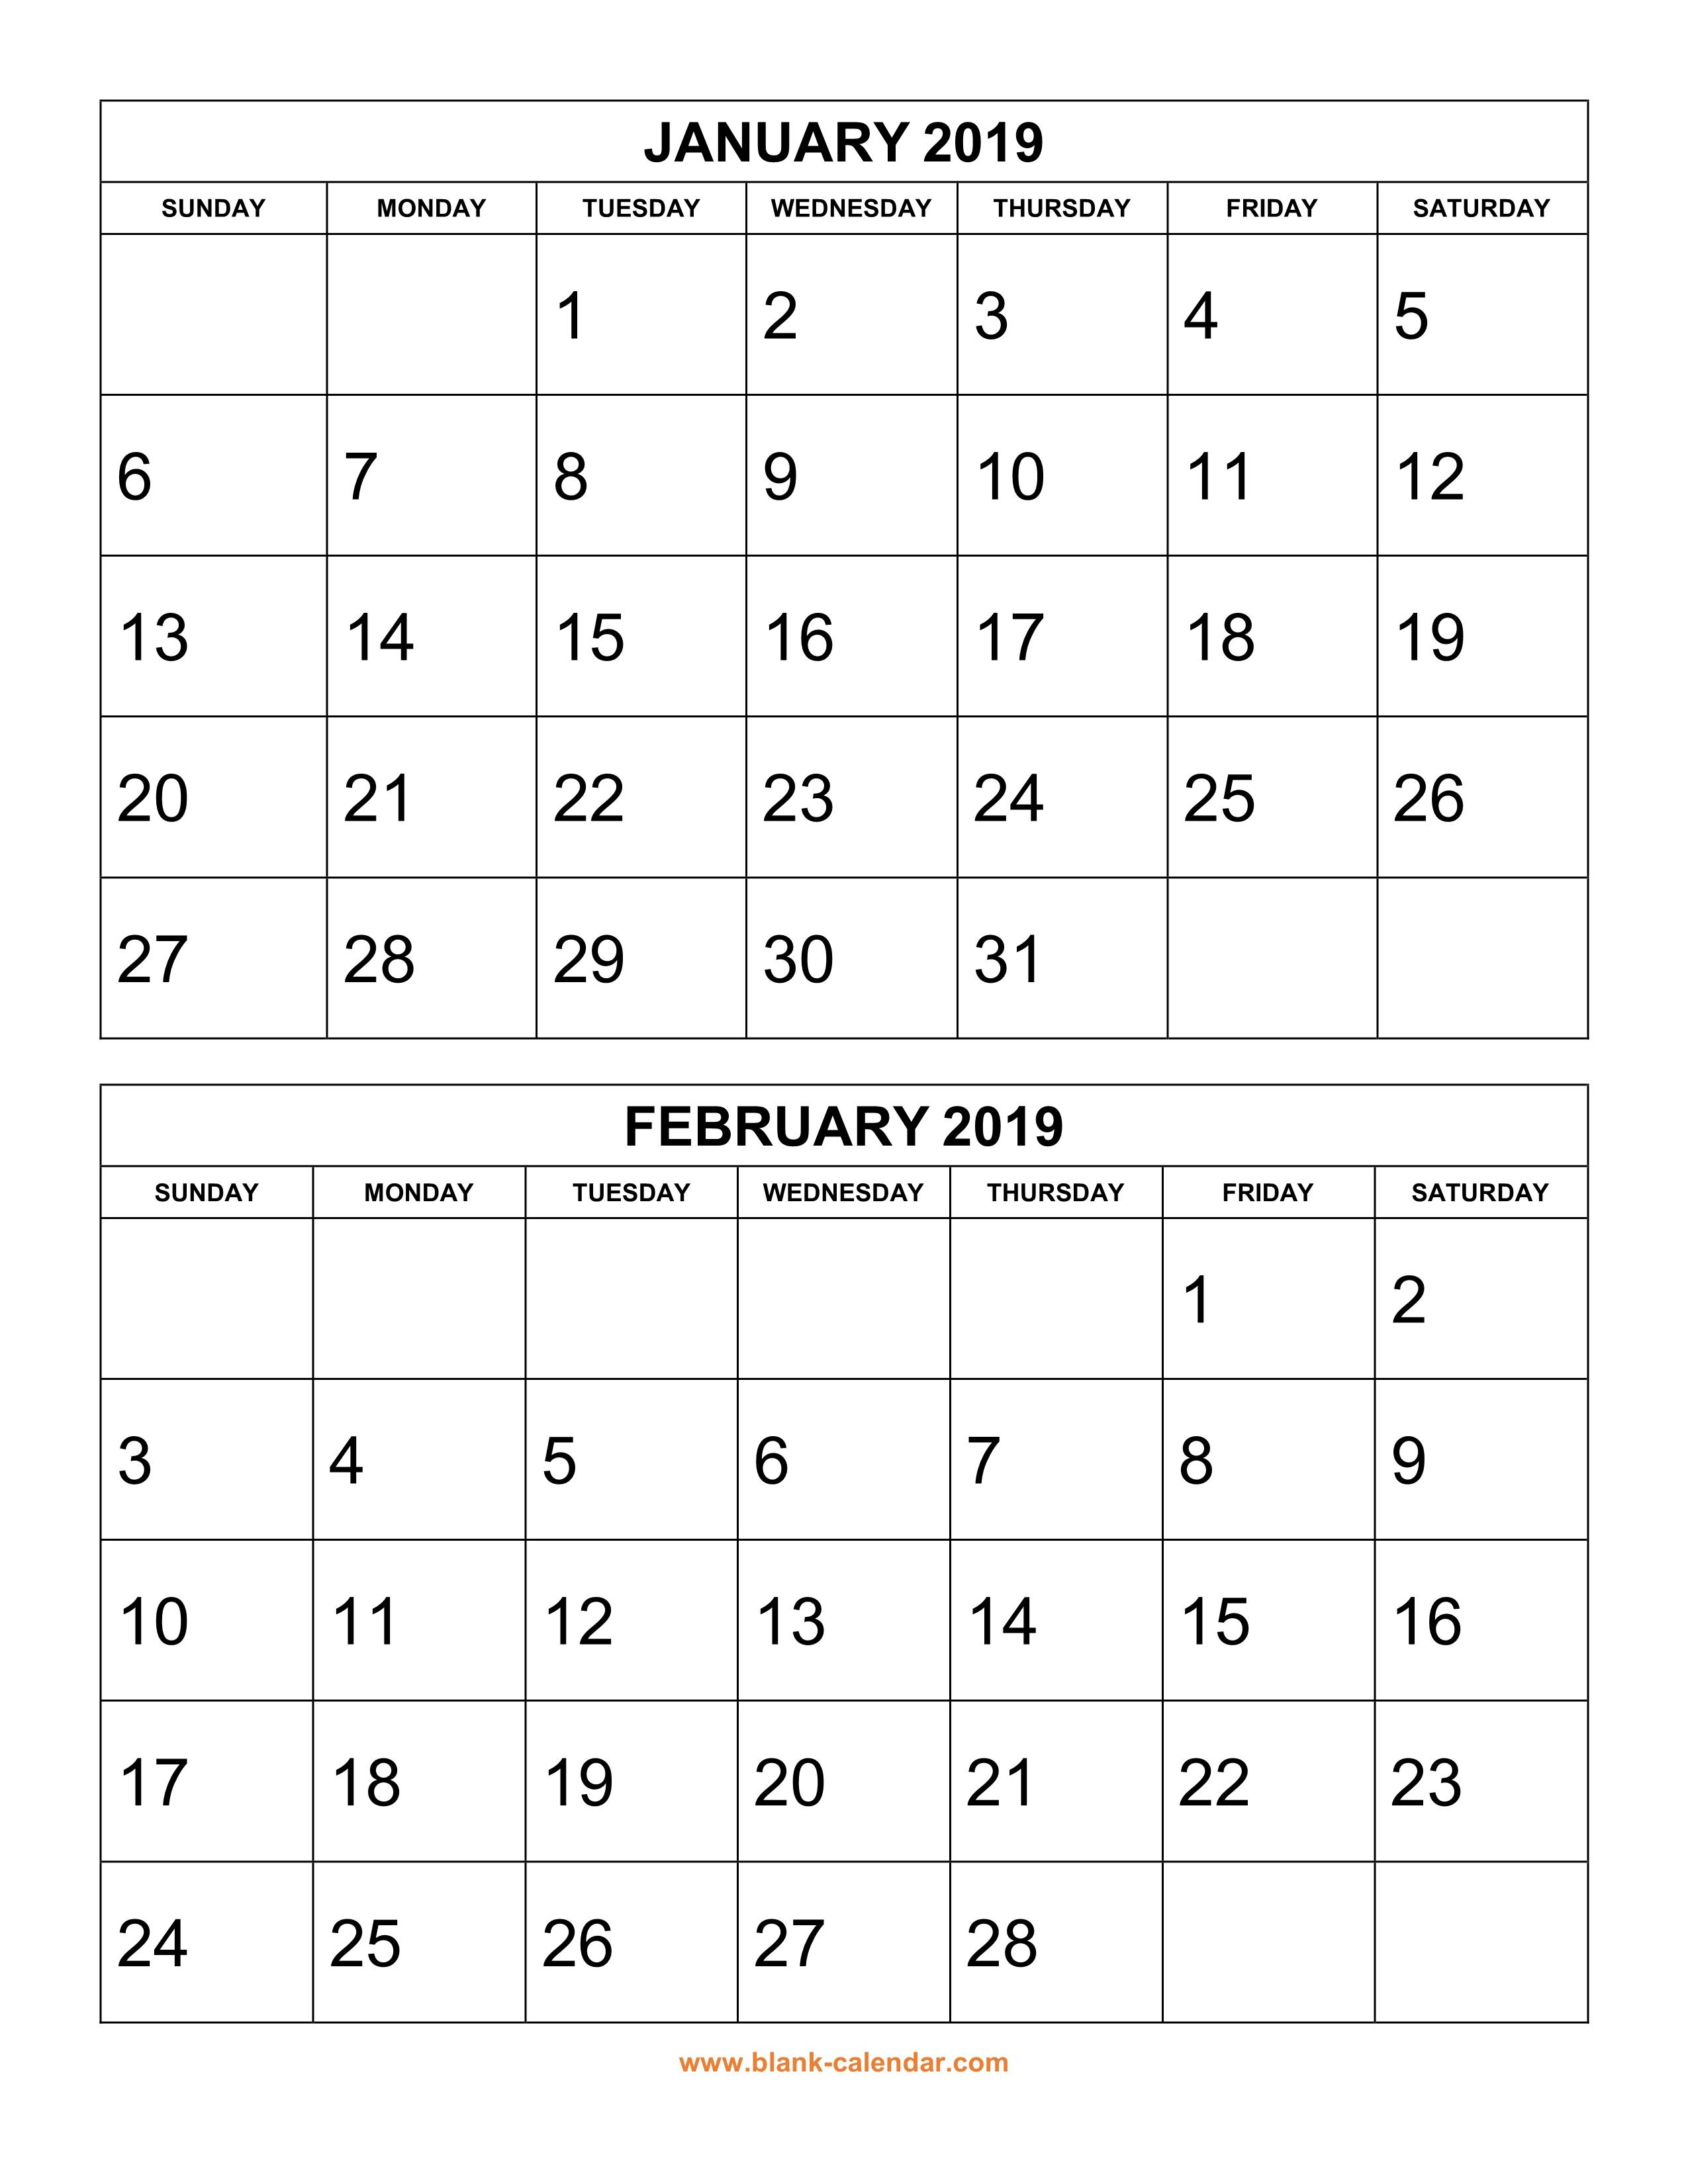 Free Download Printable Calendar 2019, 2 Months Per Page, 6 regarding Printable Calendar 3 Months Per Page